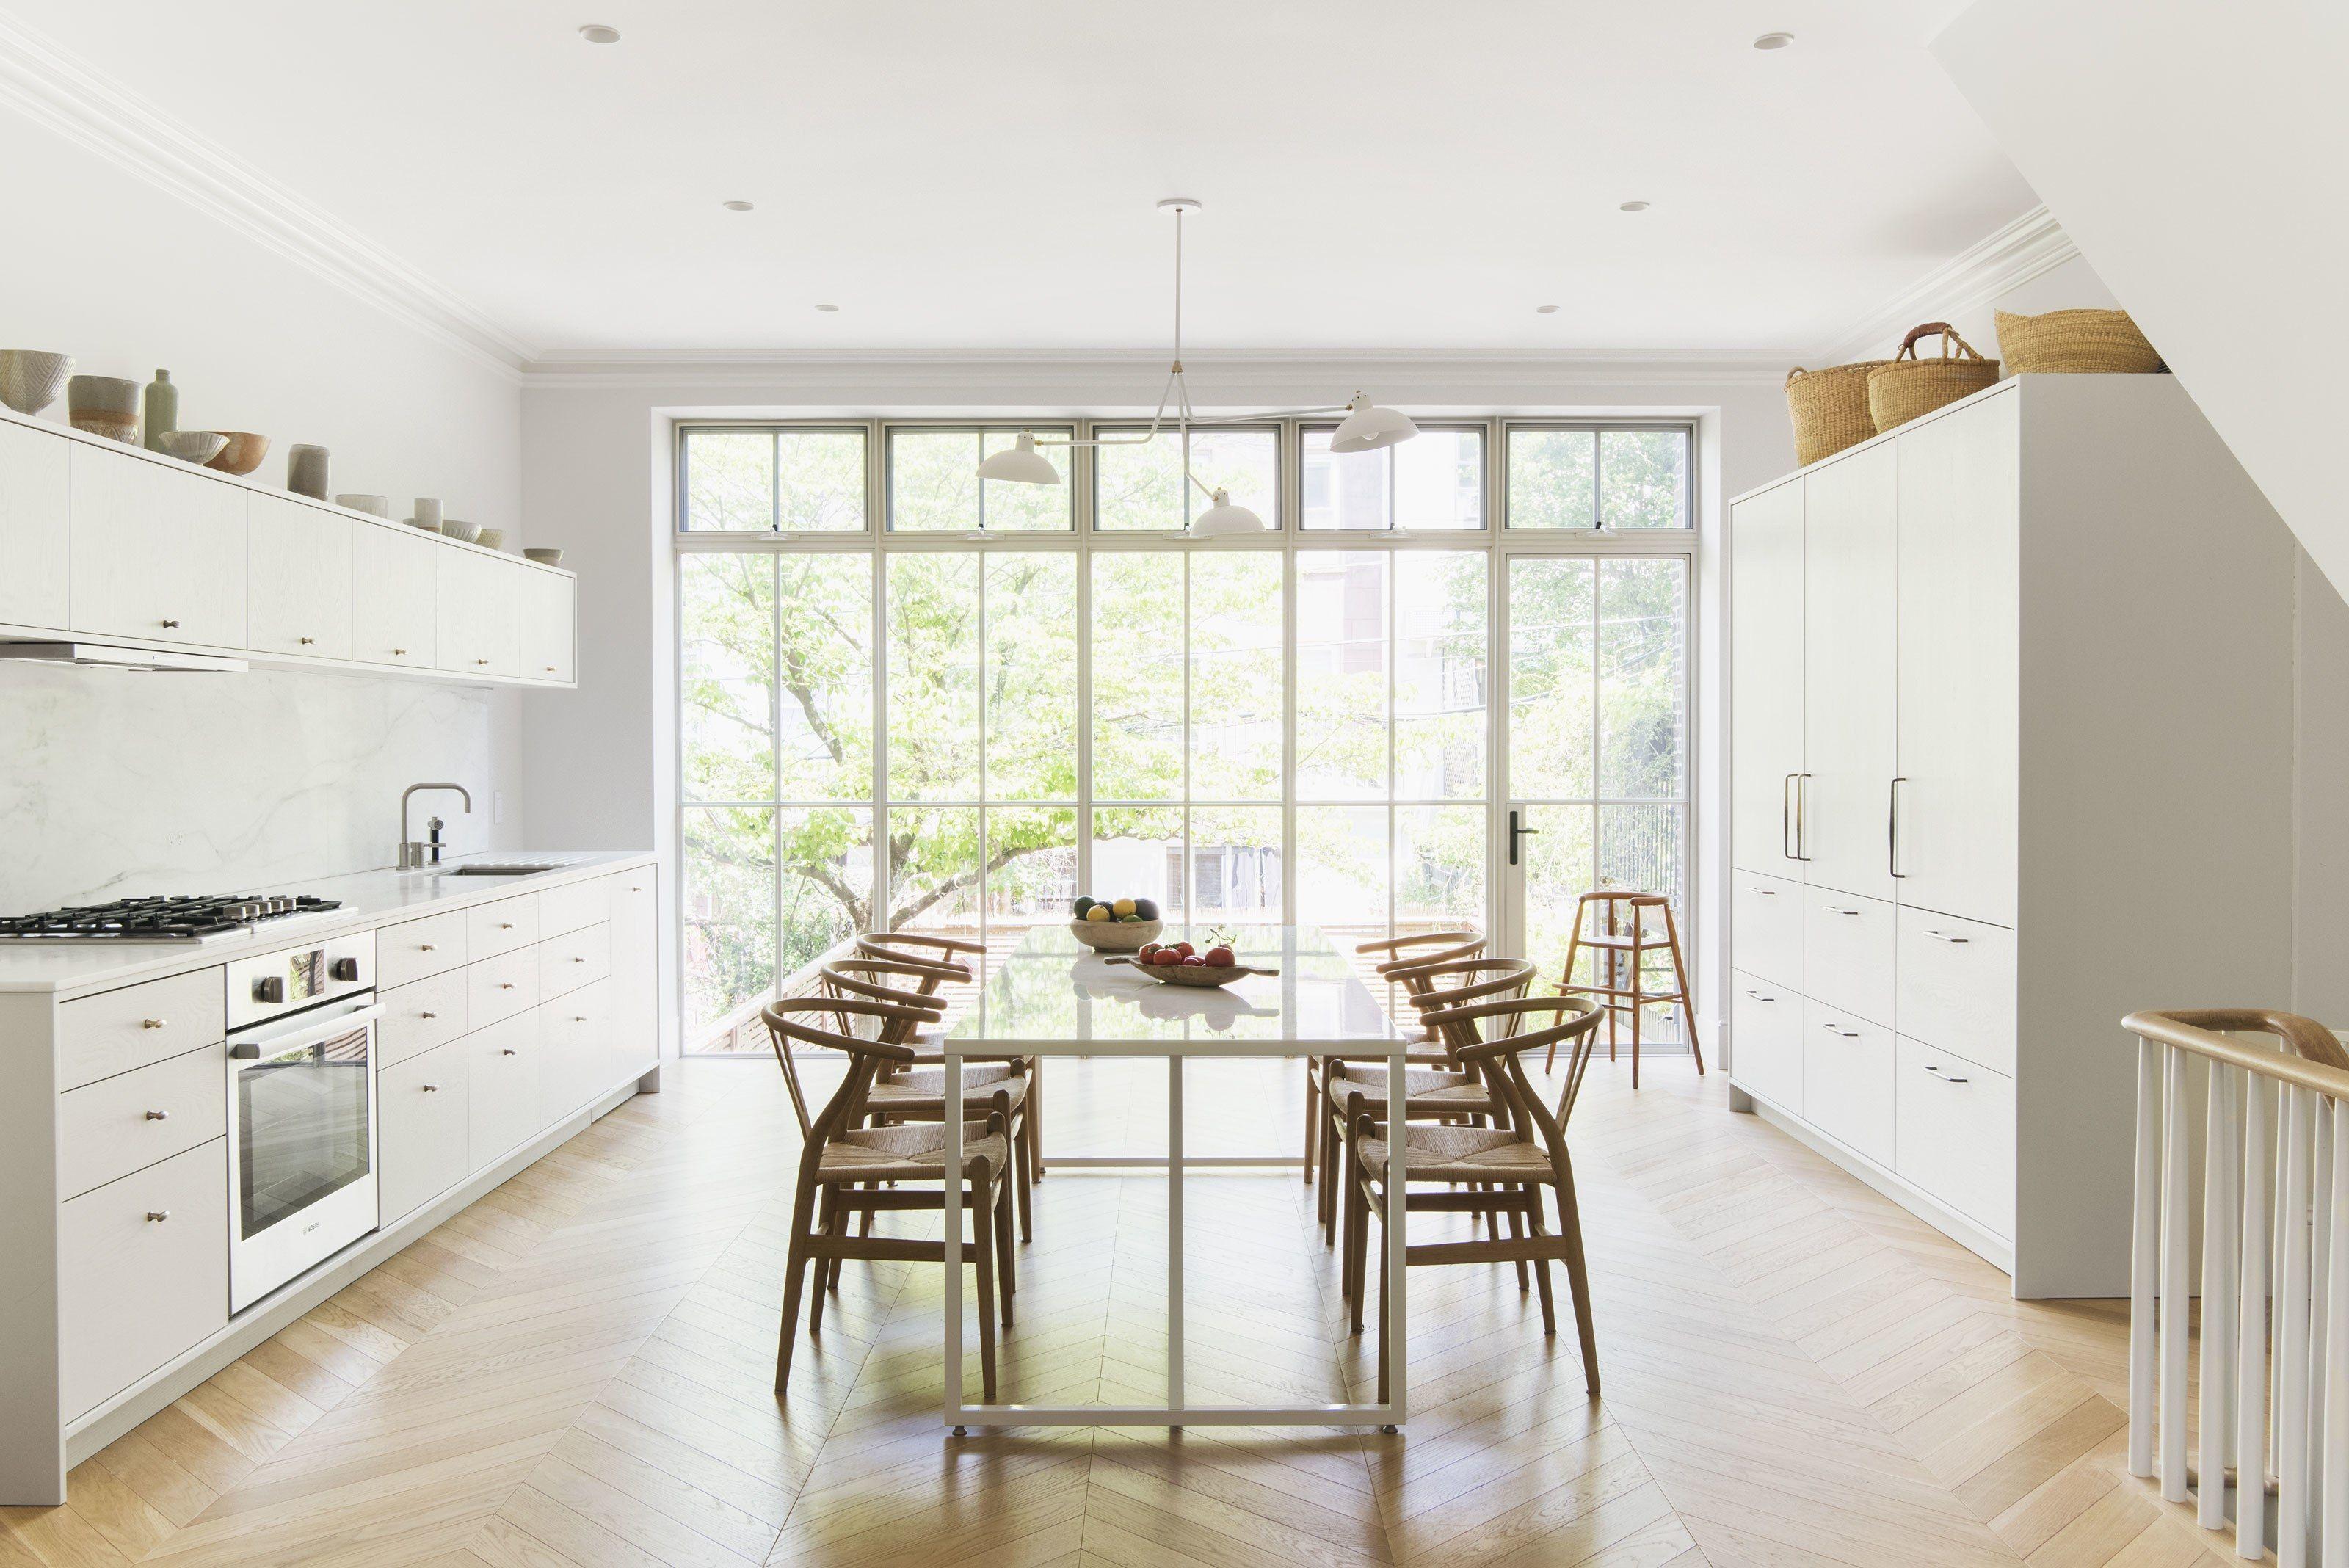 Cottage kitchens This Minimalist New York Apartment